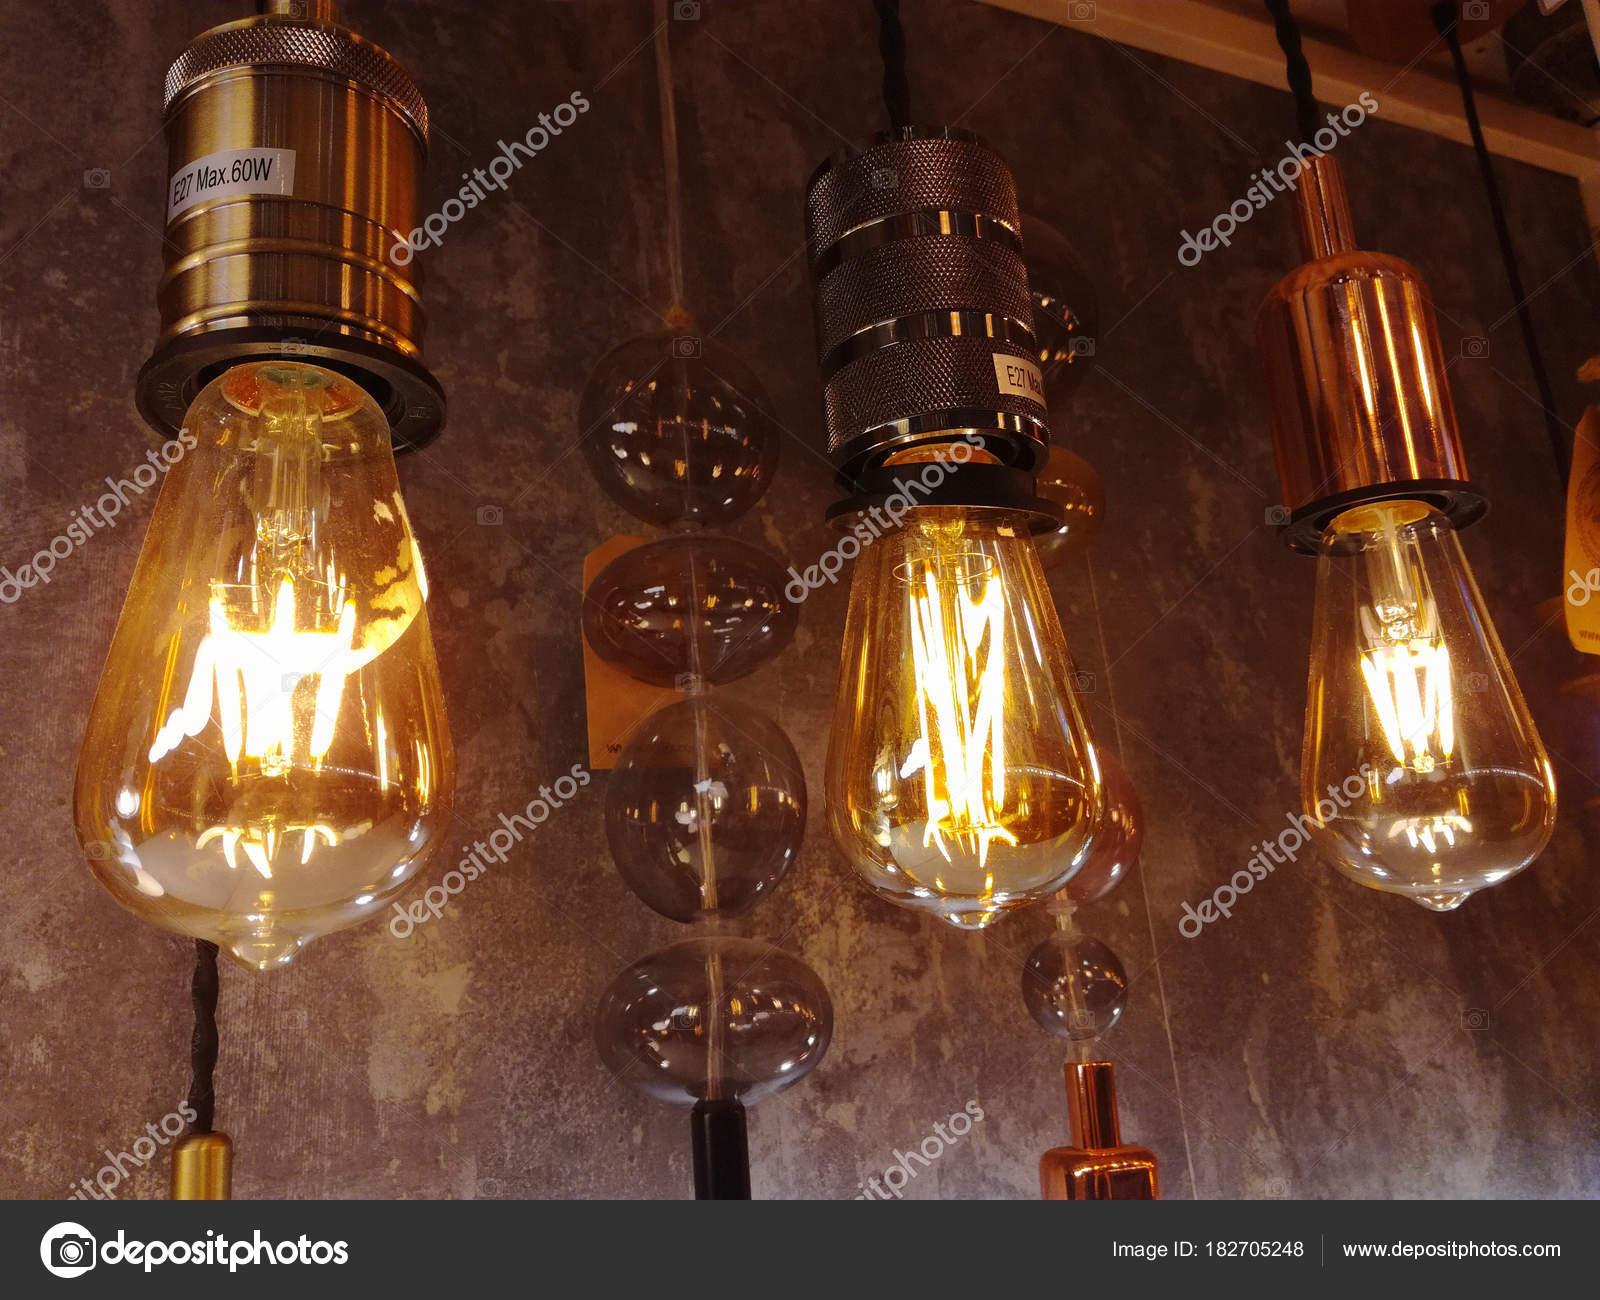 Luce loft design vintage illuminazione lampade incandescenza